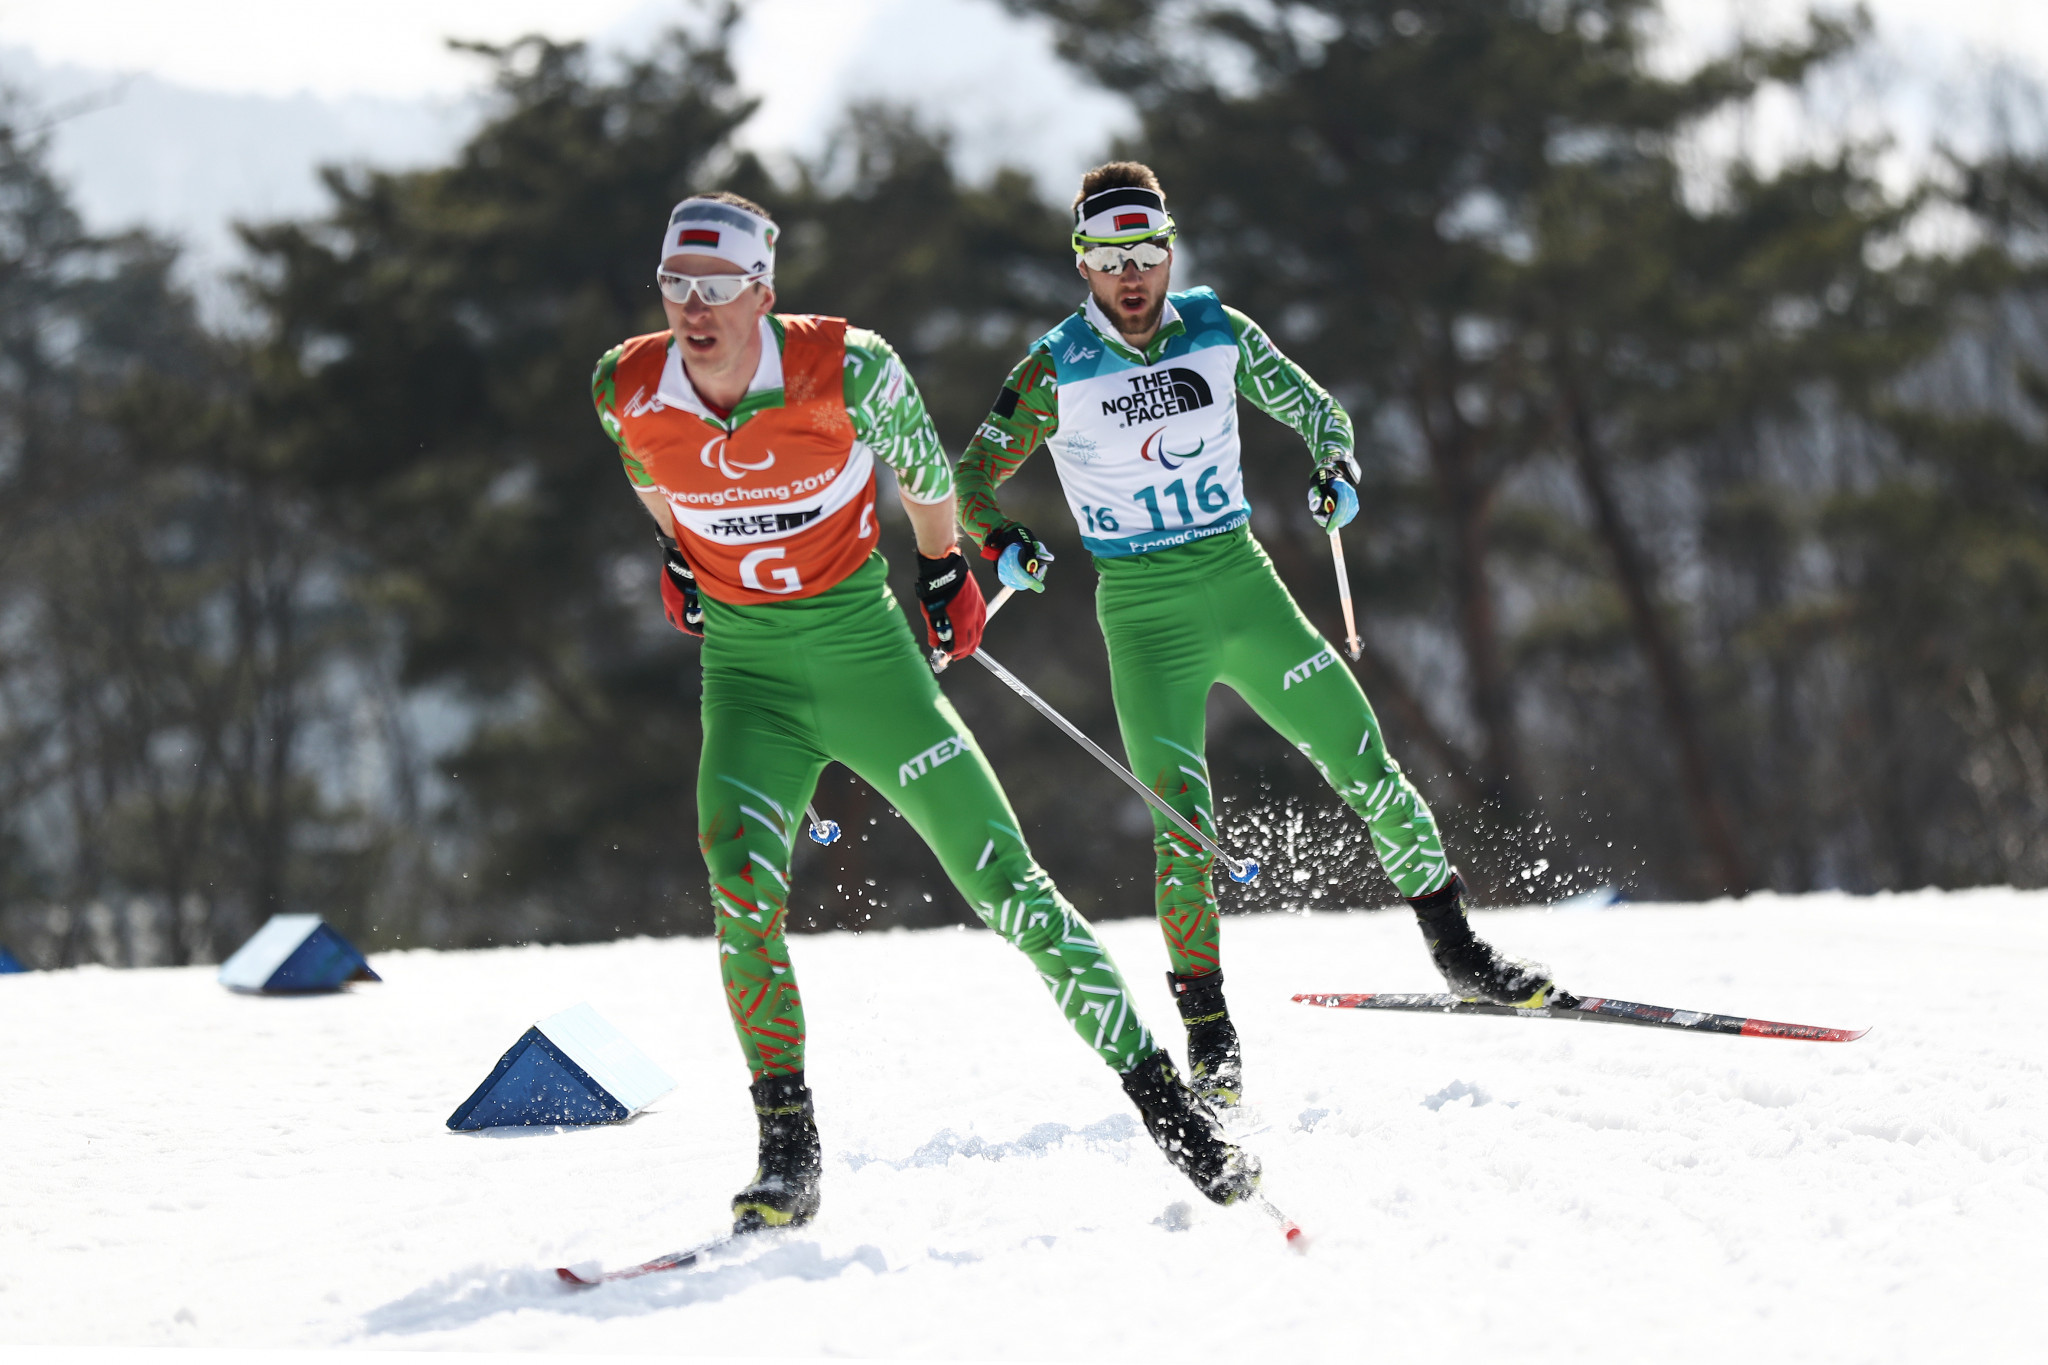 Belarus' Yury Holub wins maiden World Para Nordic Skiing crystal globe